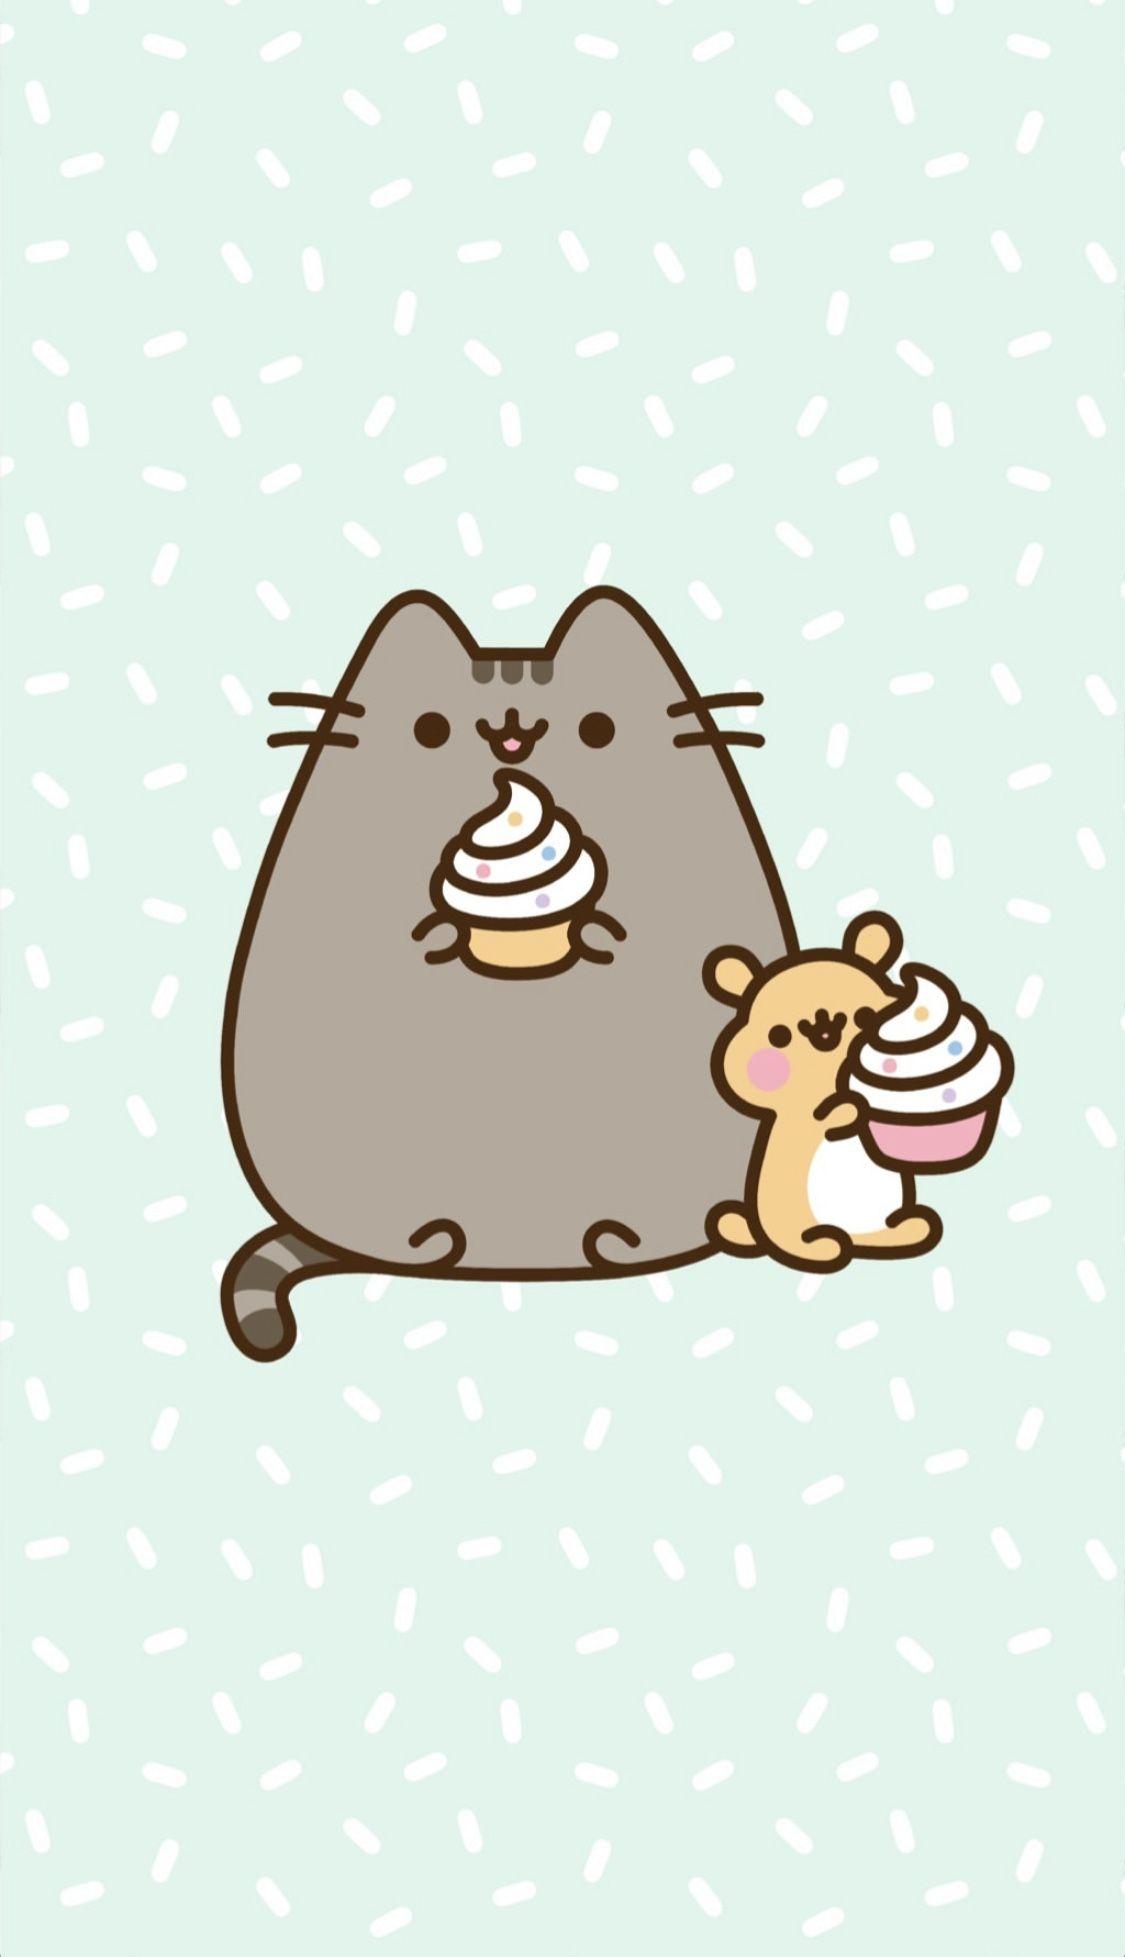 Pin By Jessica Grant On Wallpapers Kawaii Pusheen Cute Pusheen Cat Wallpaper Iphone Cute